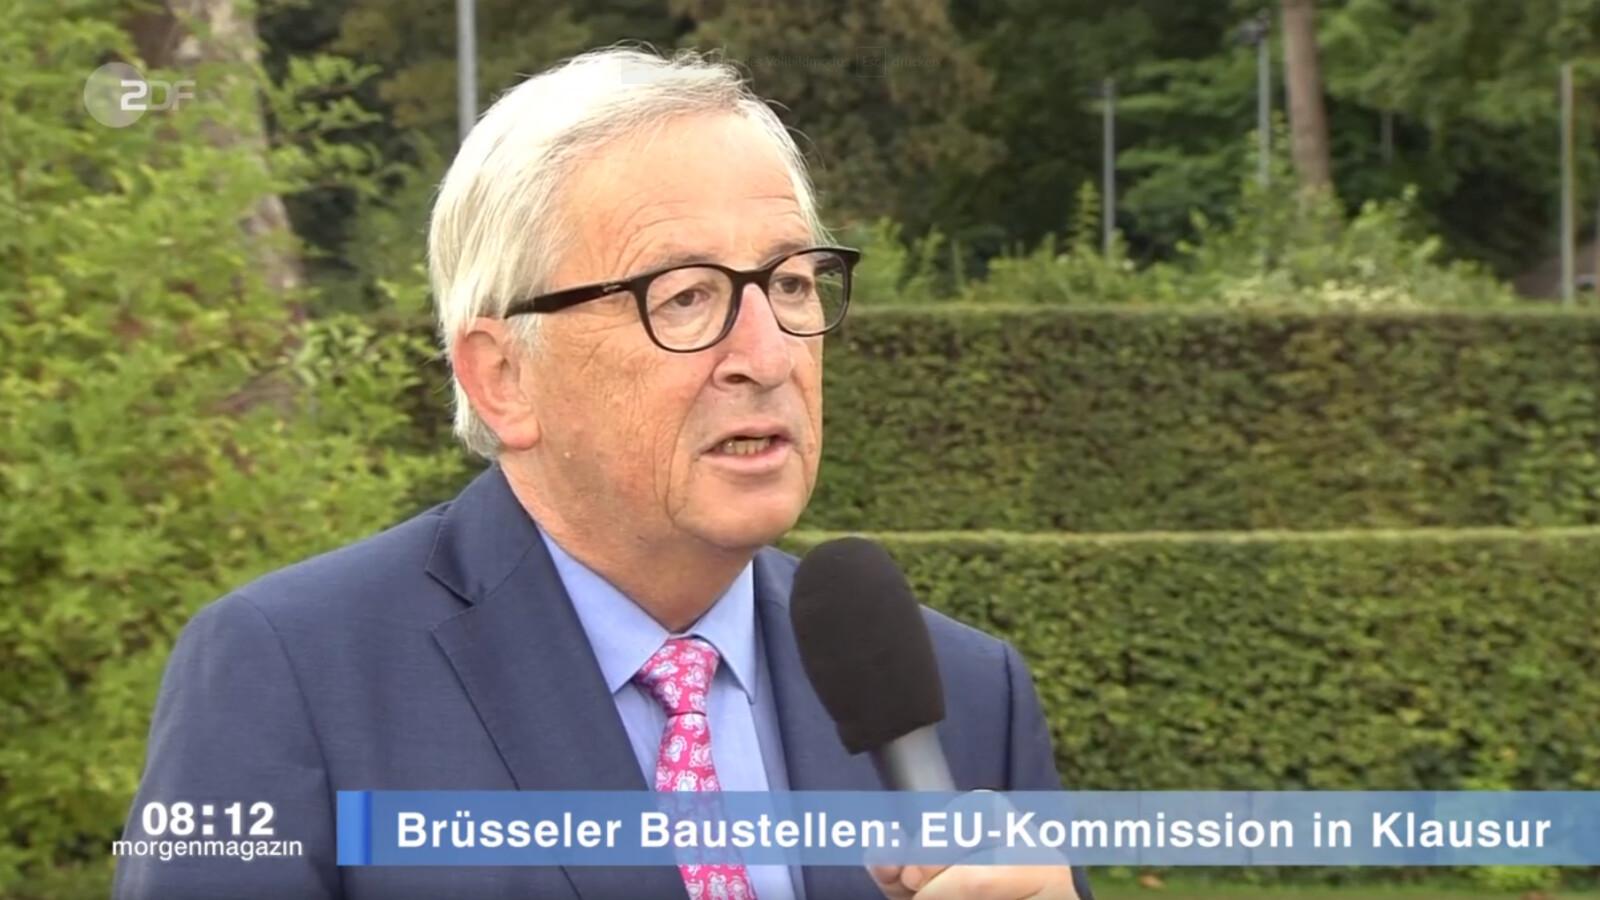 Abschaffung der Zeitumstellung: EU-Kommissionspräsident bestätigt Ergebnis